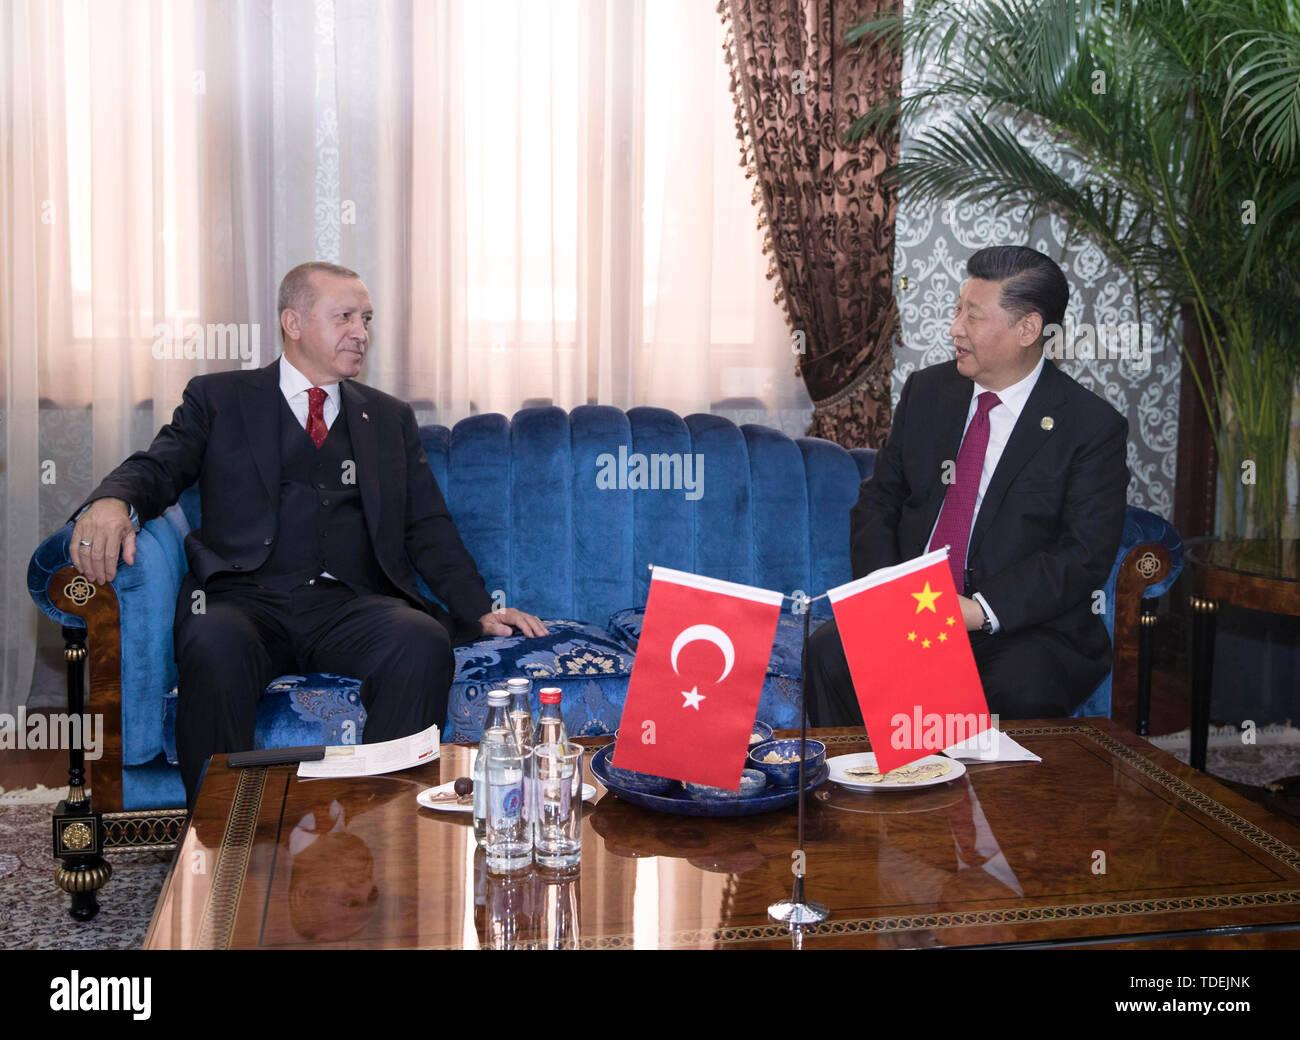 Dushanbe, Tajikistan. 15th June, 2019. Chinese President Xi Jinping (R) meets with his Turkish counterpart Recep Tayyip Erdogan in Dushanbe, Tajikistan, June 15, 2019. Credit: Wang Ye/Xinhua/Alamy Live News - Stock Image